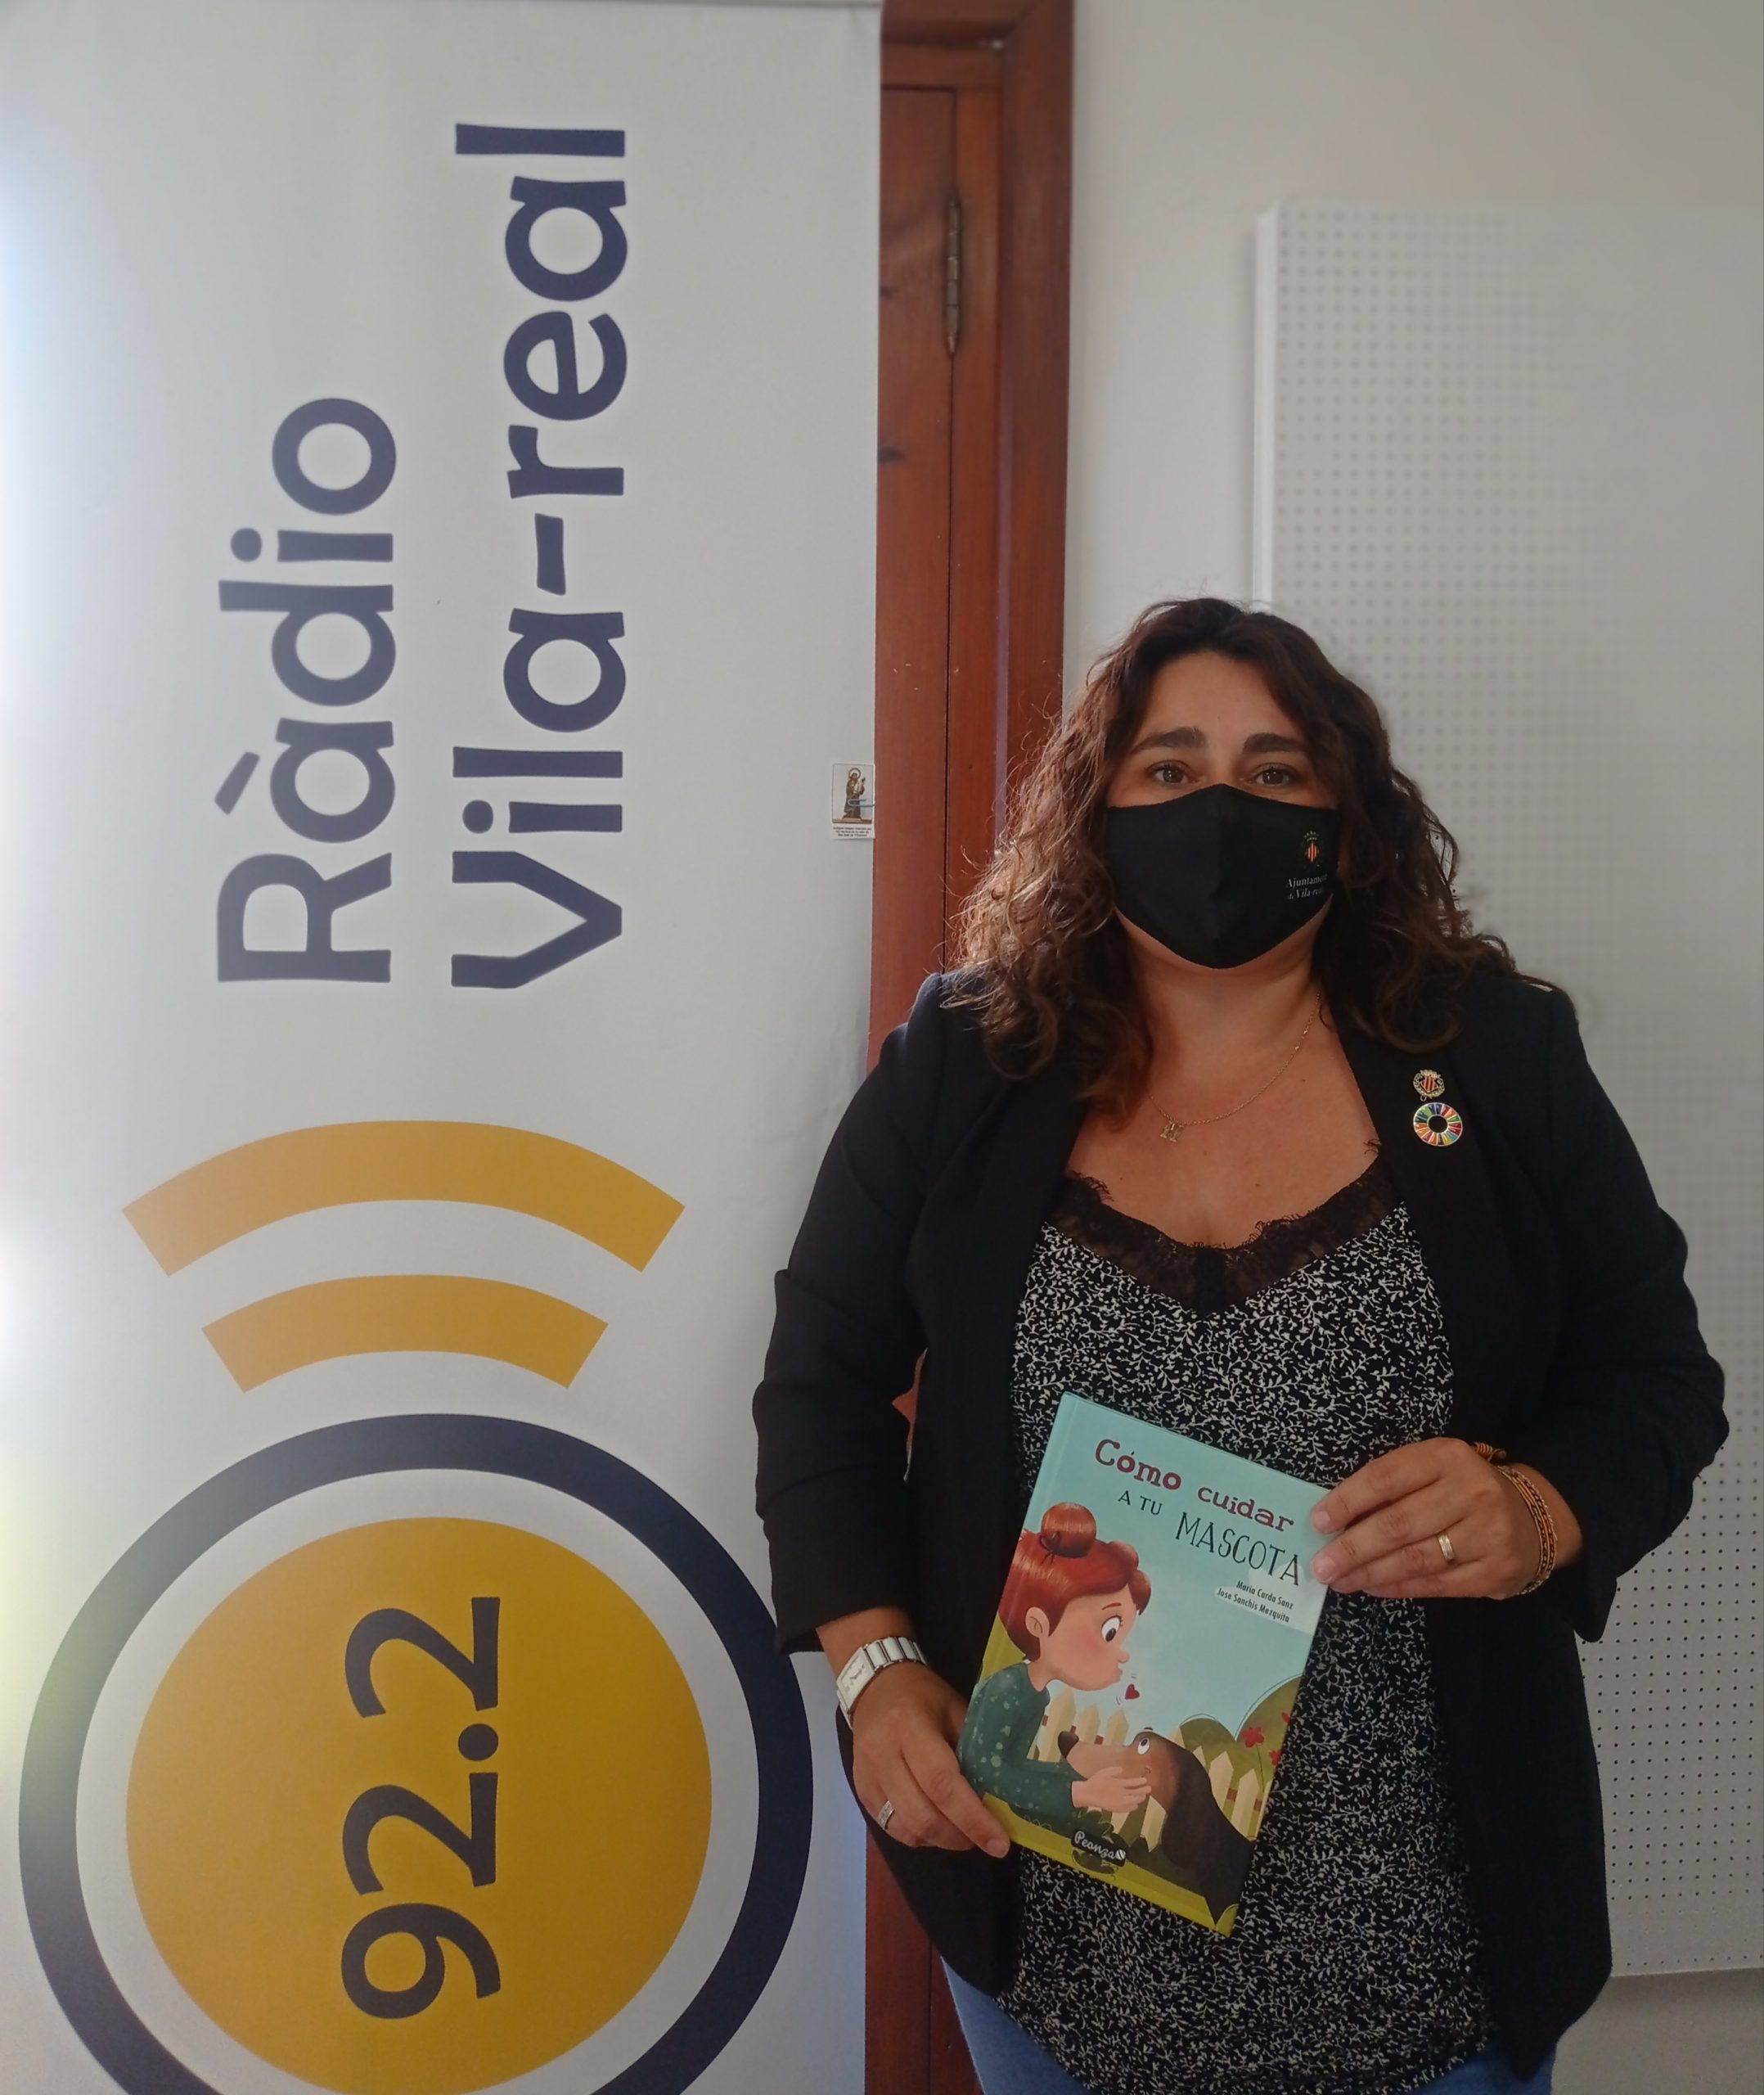 Entrevista a la concejala de Proximidad de Vila-real, Miriam Caravaca